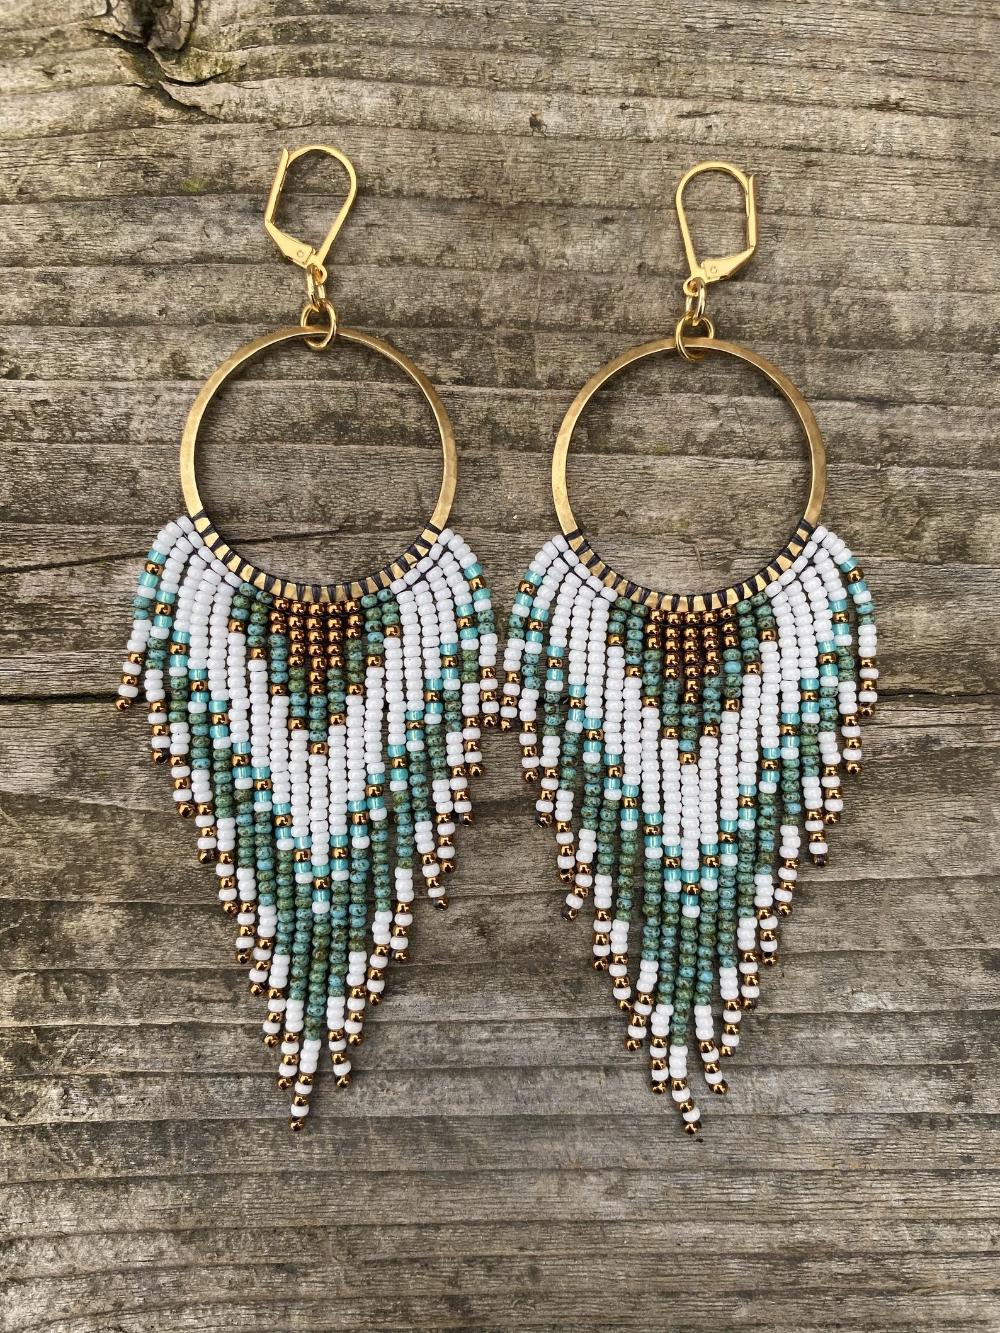 Unique Artisan Earrings Blue Gold Beaded Earrings One of a Kind Accessory Seed Bead Earrings Etched Glass Bead Earrings Bridal Earrings